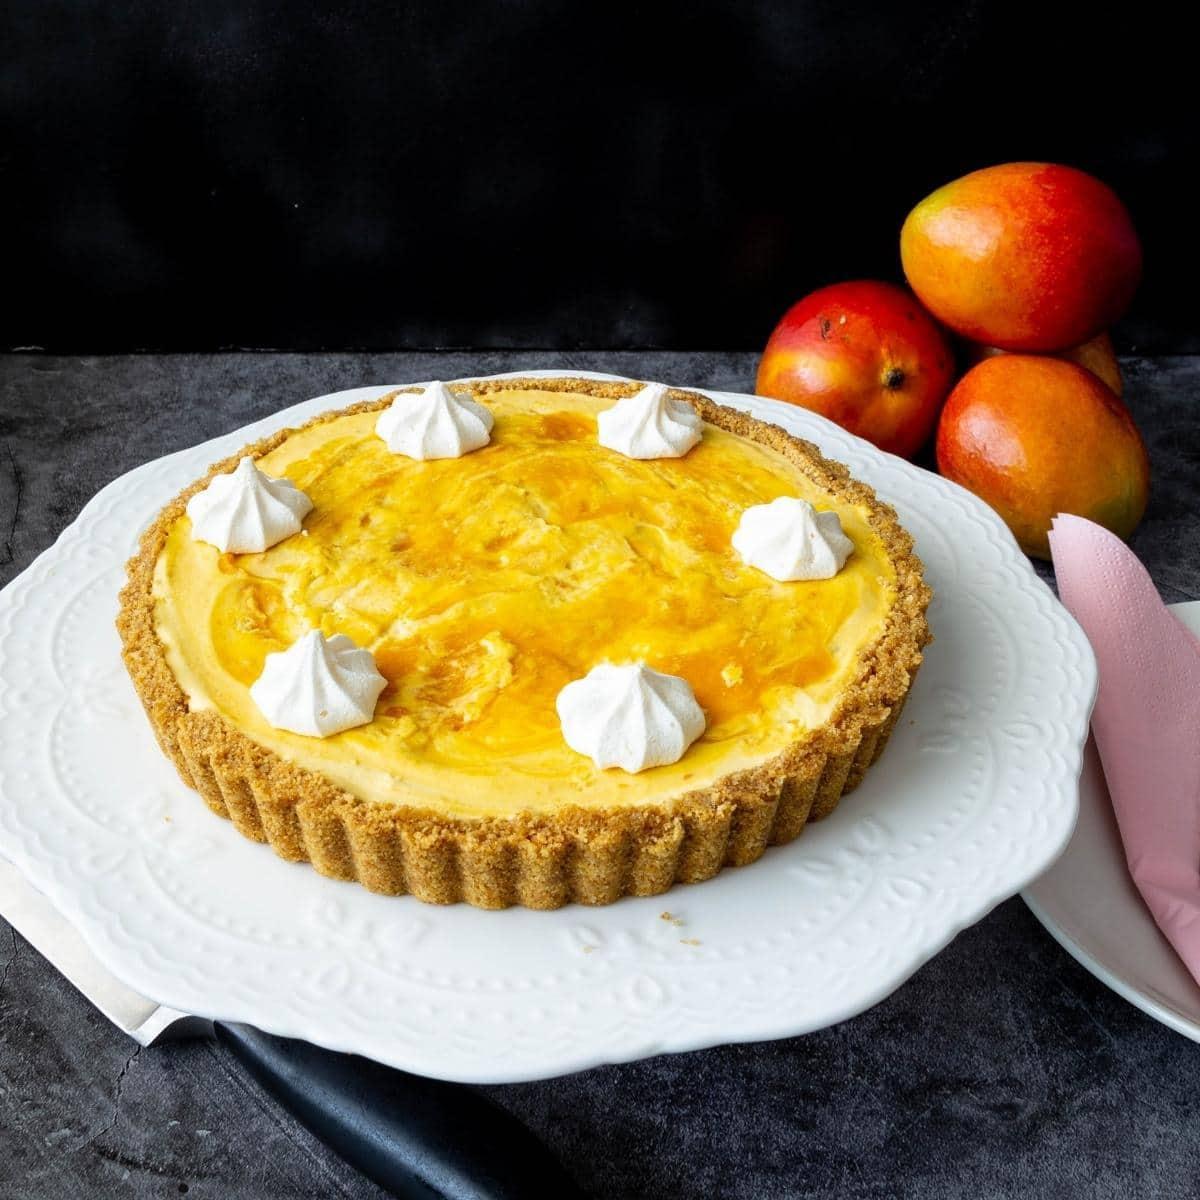 Mango cheesecake tart on a cake stand.